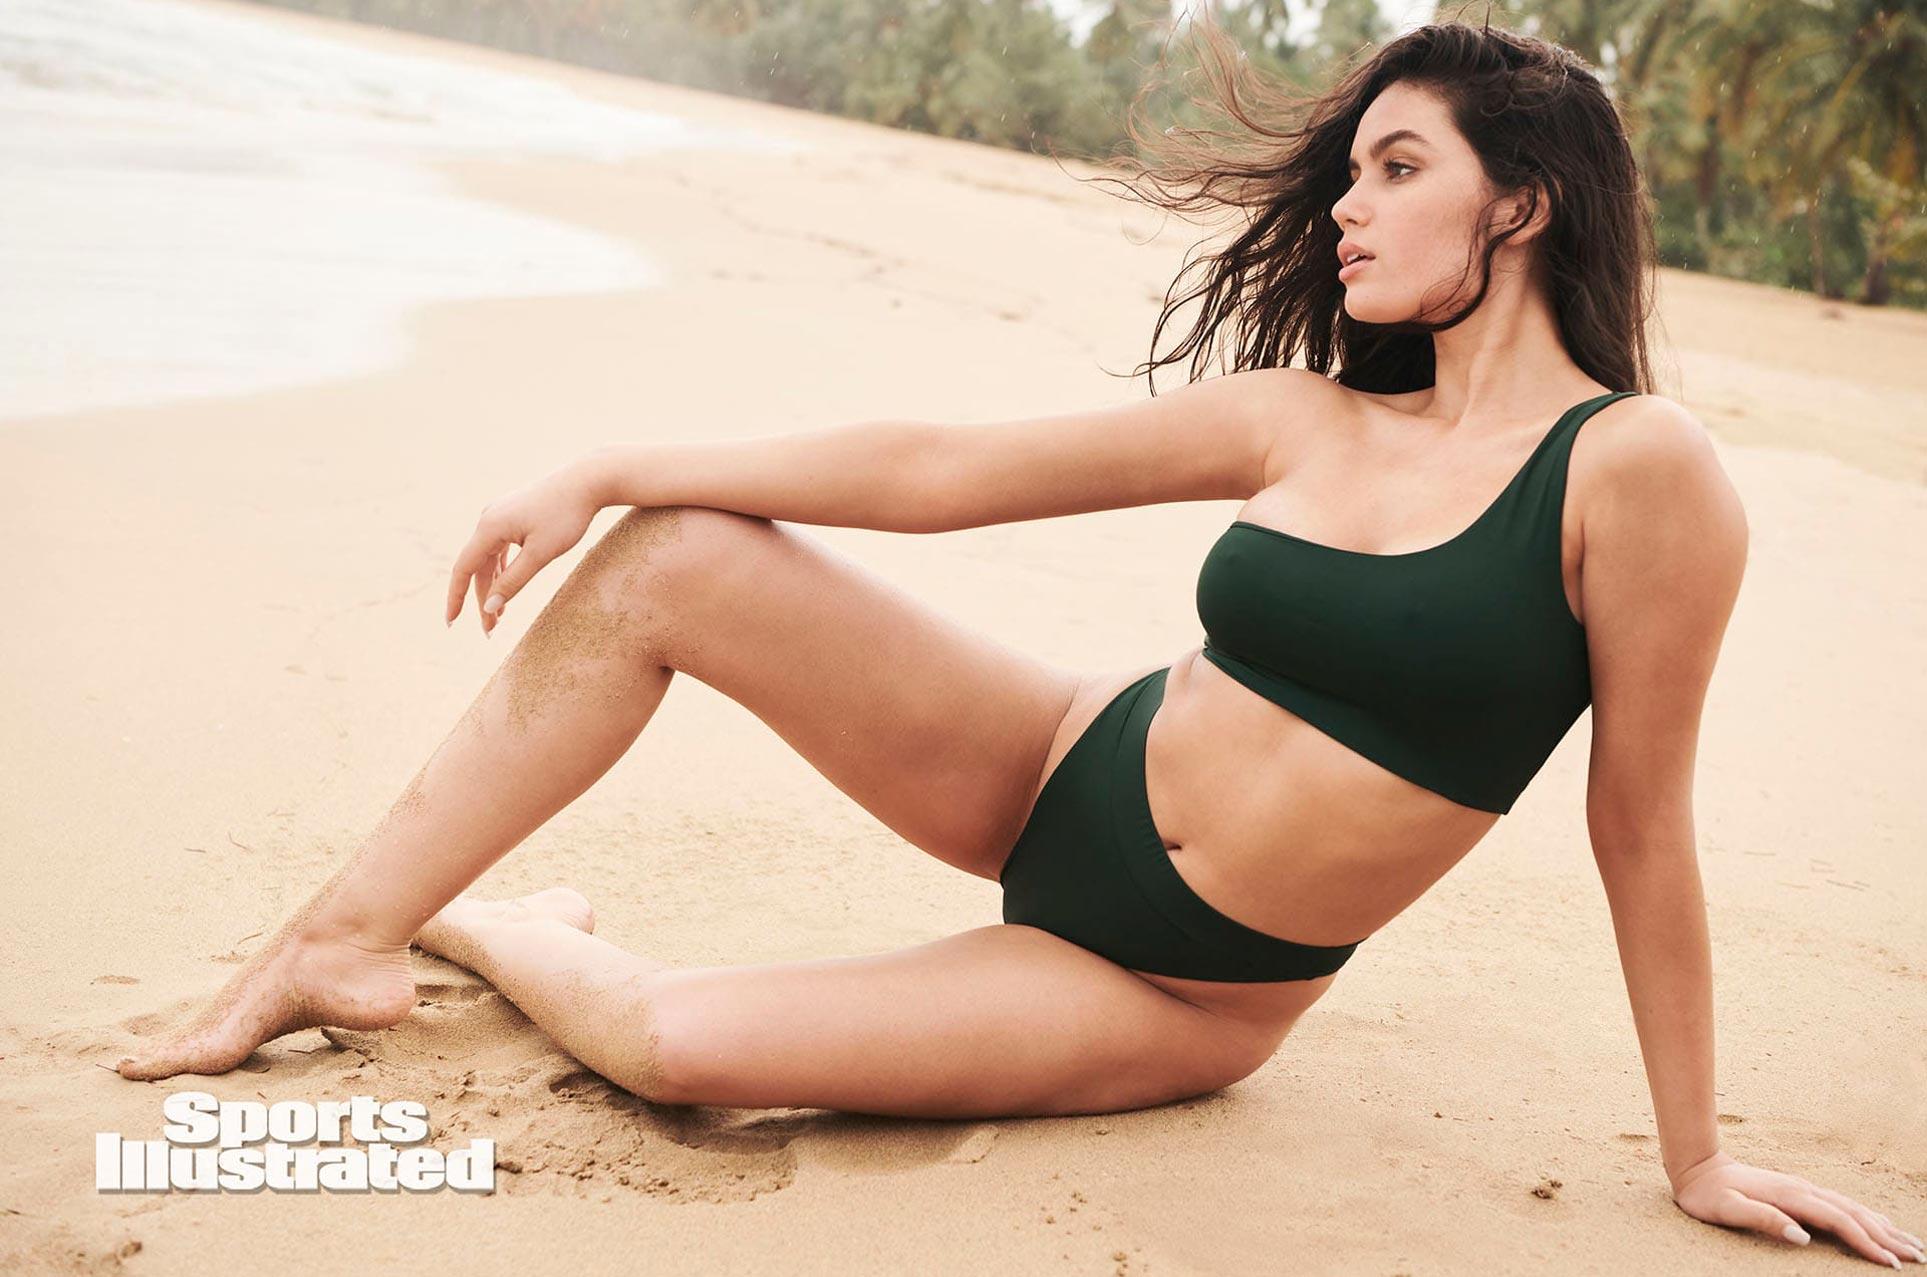 Энн де Паула в каталоге купальников Sports Illustrated Swimsuit 2020 / фото 25